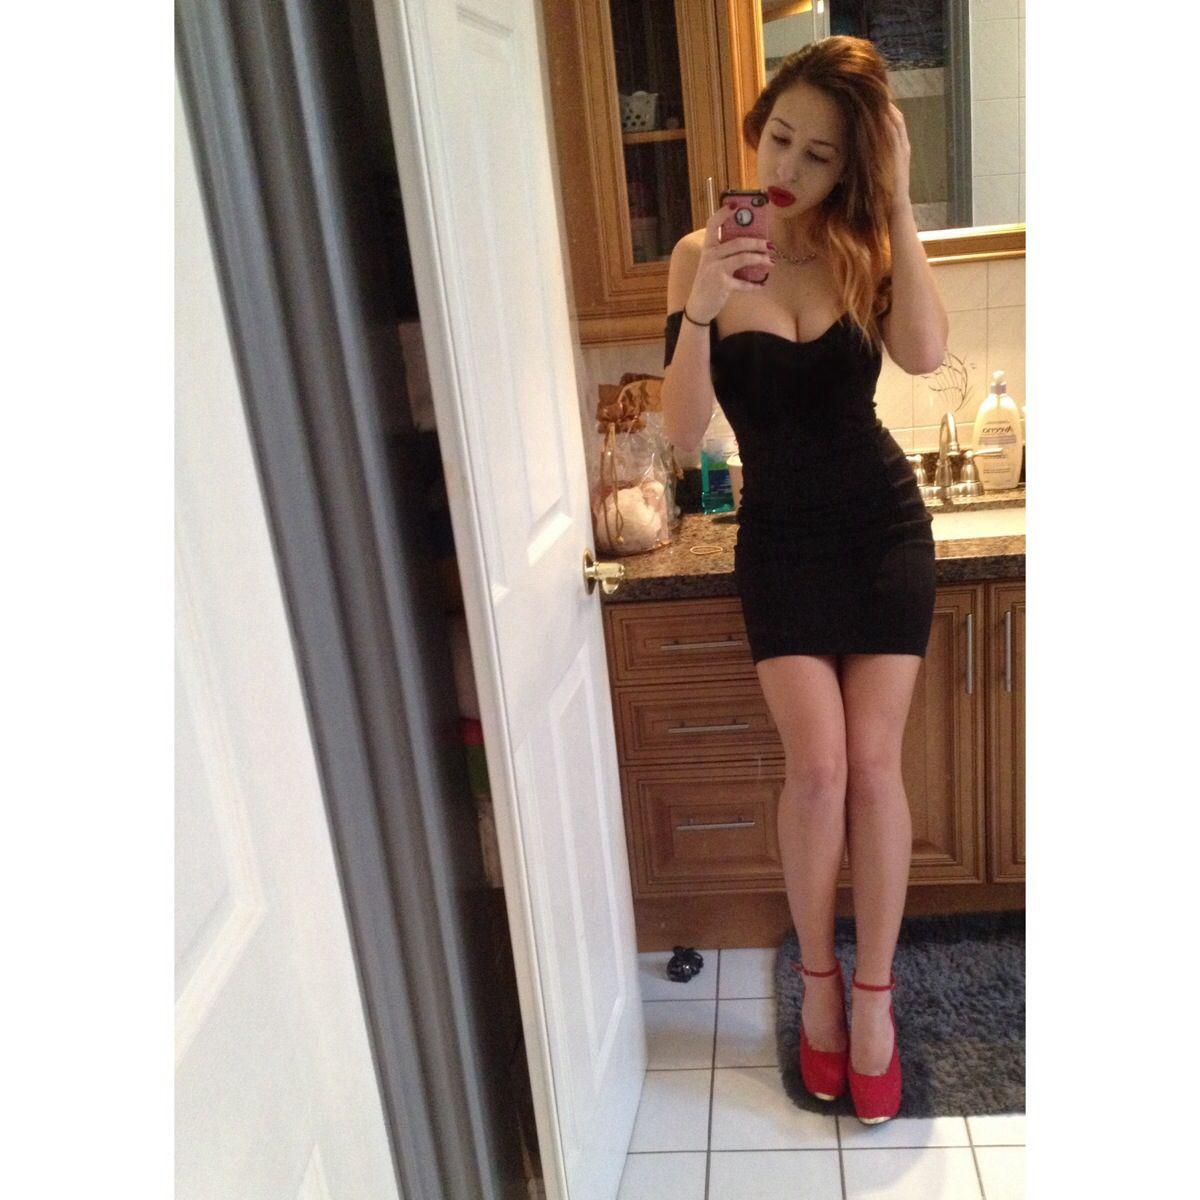 Little black dress • off the shoulder • red lips • red pumps • ombré hair